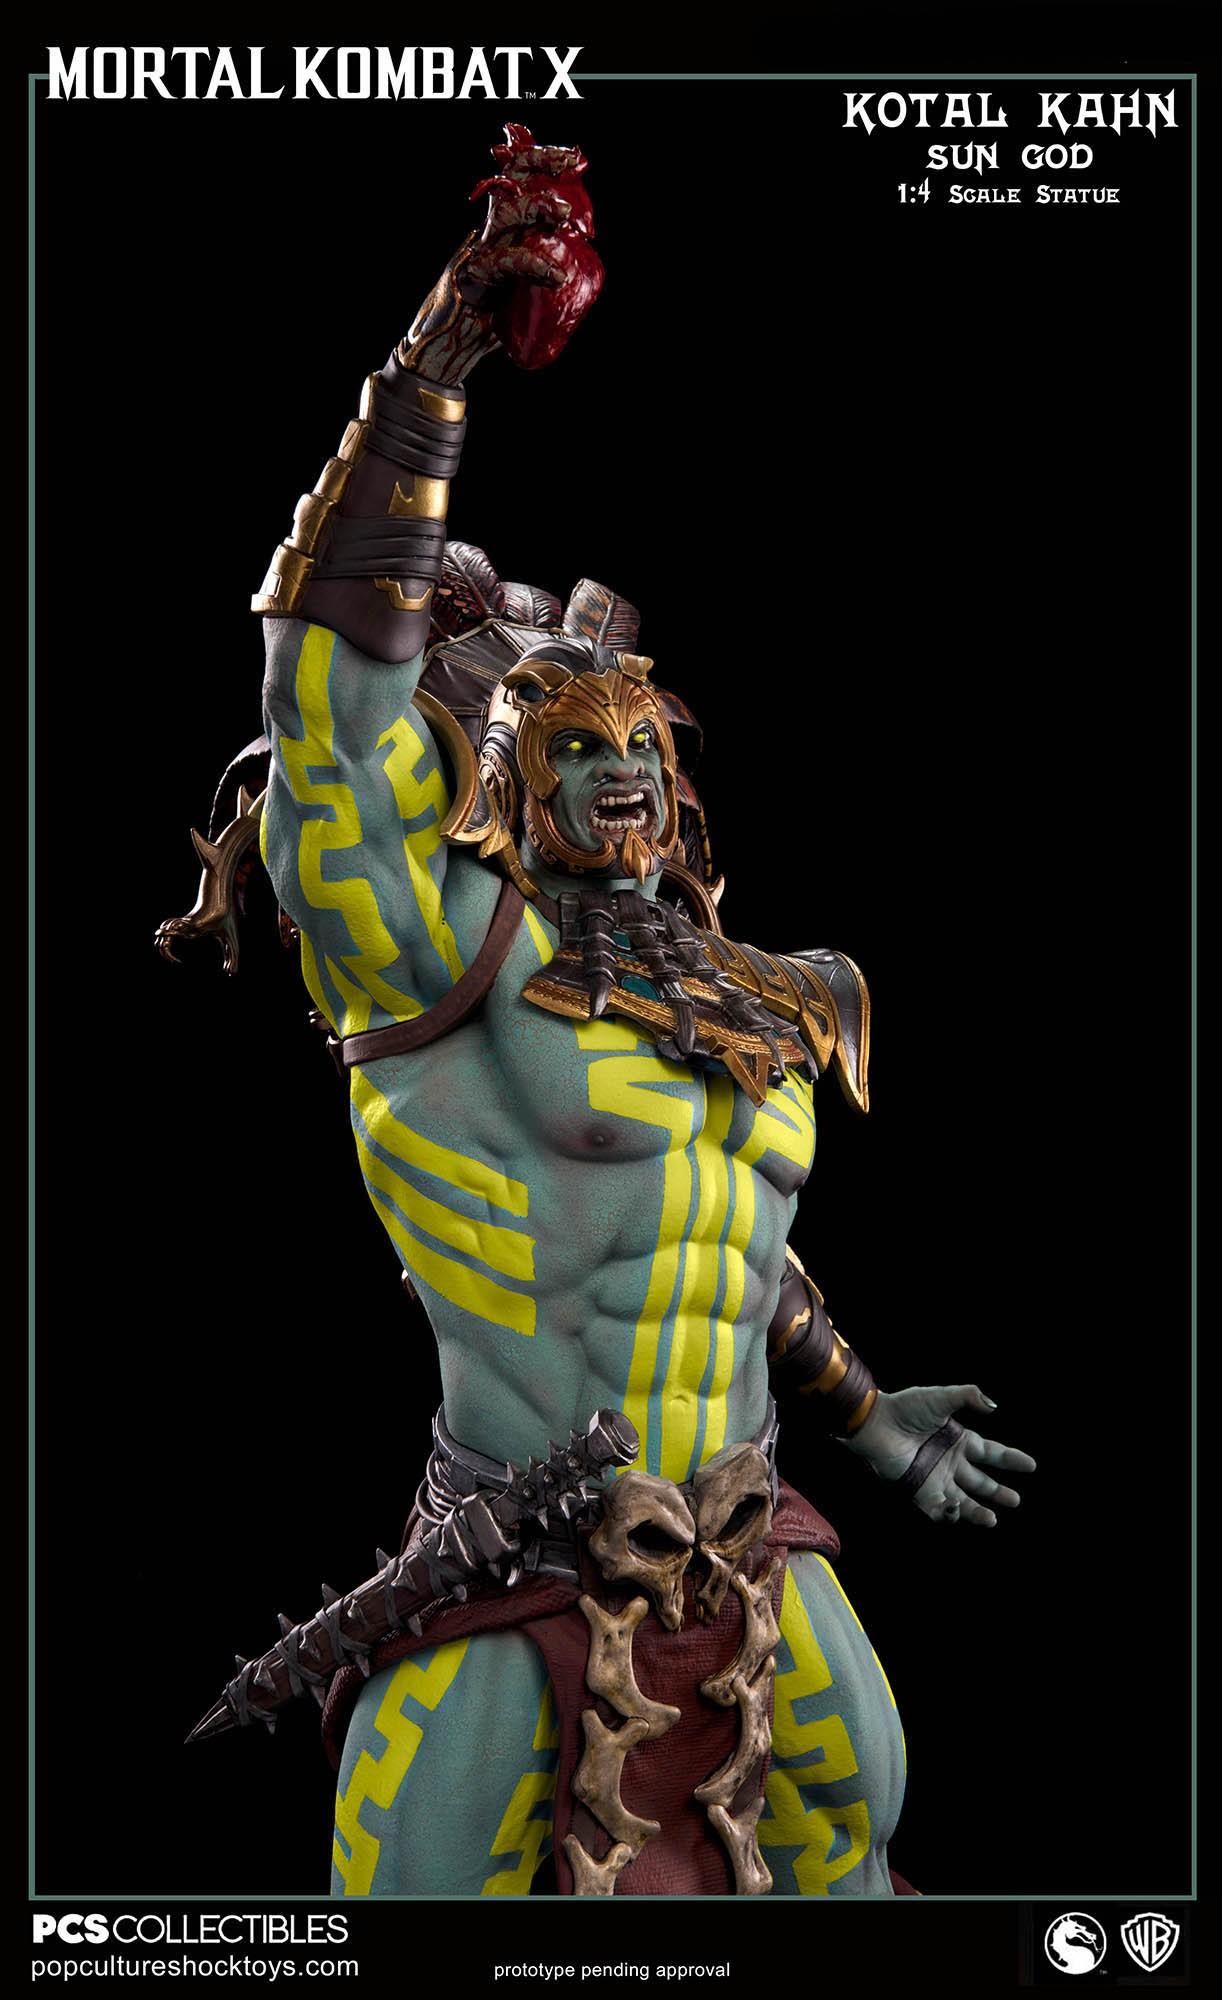 [Pop Culture Shock] Mortal Kombat X: Kotal Kahn 1:4 scale PCS-Kotal-Kahn-Sun-God-015